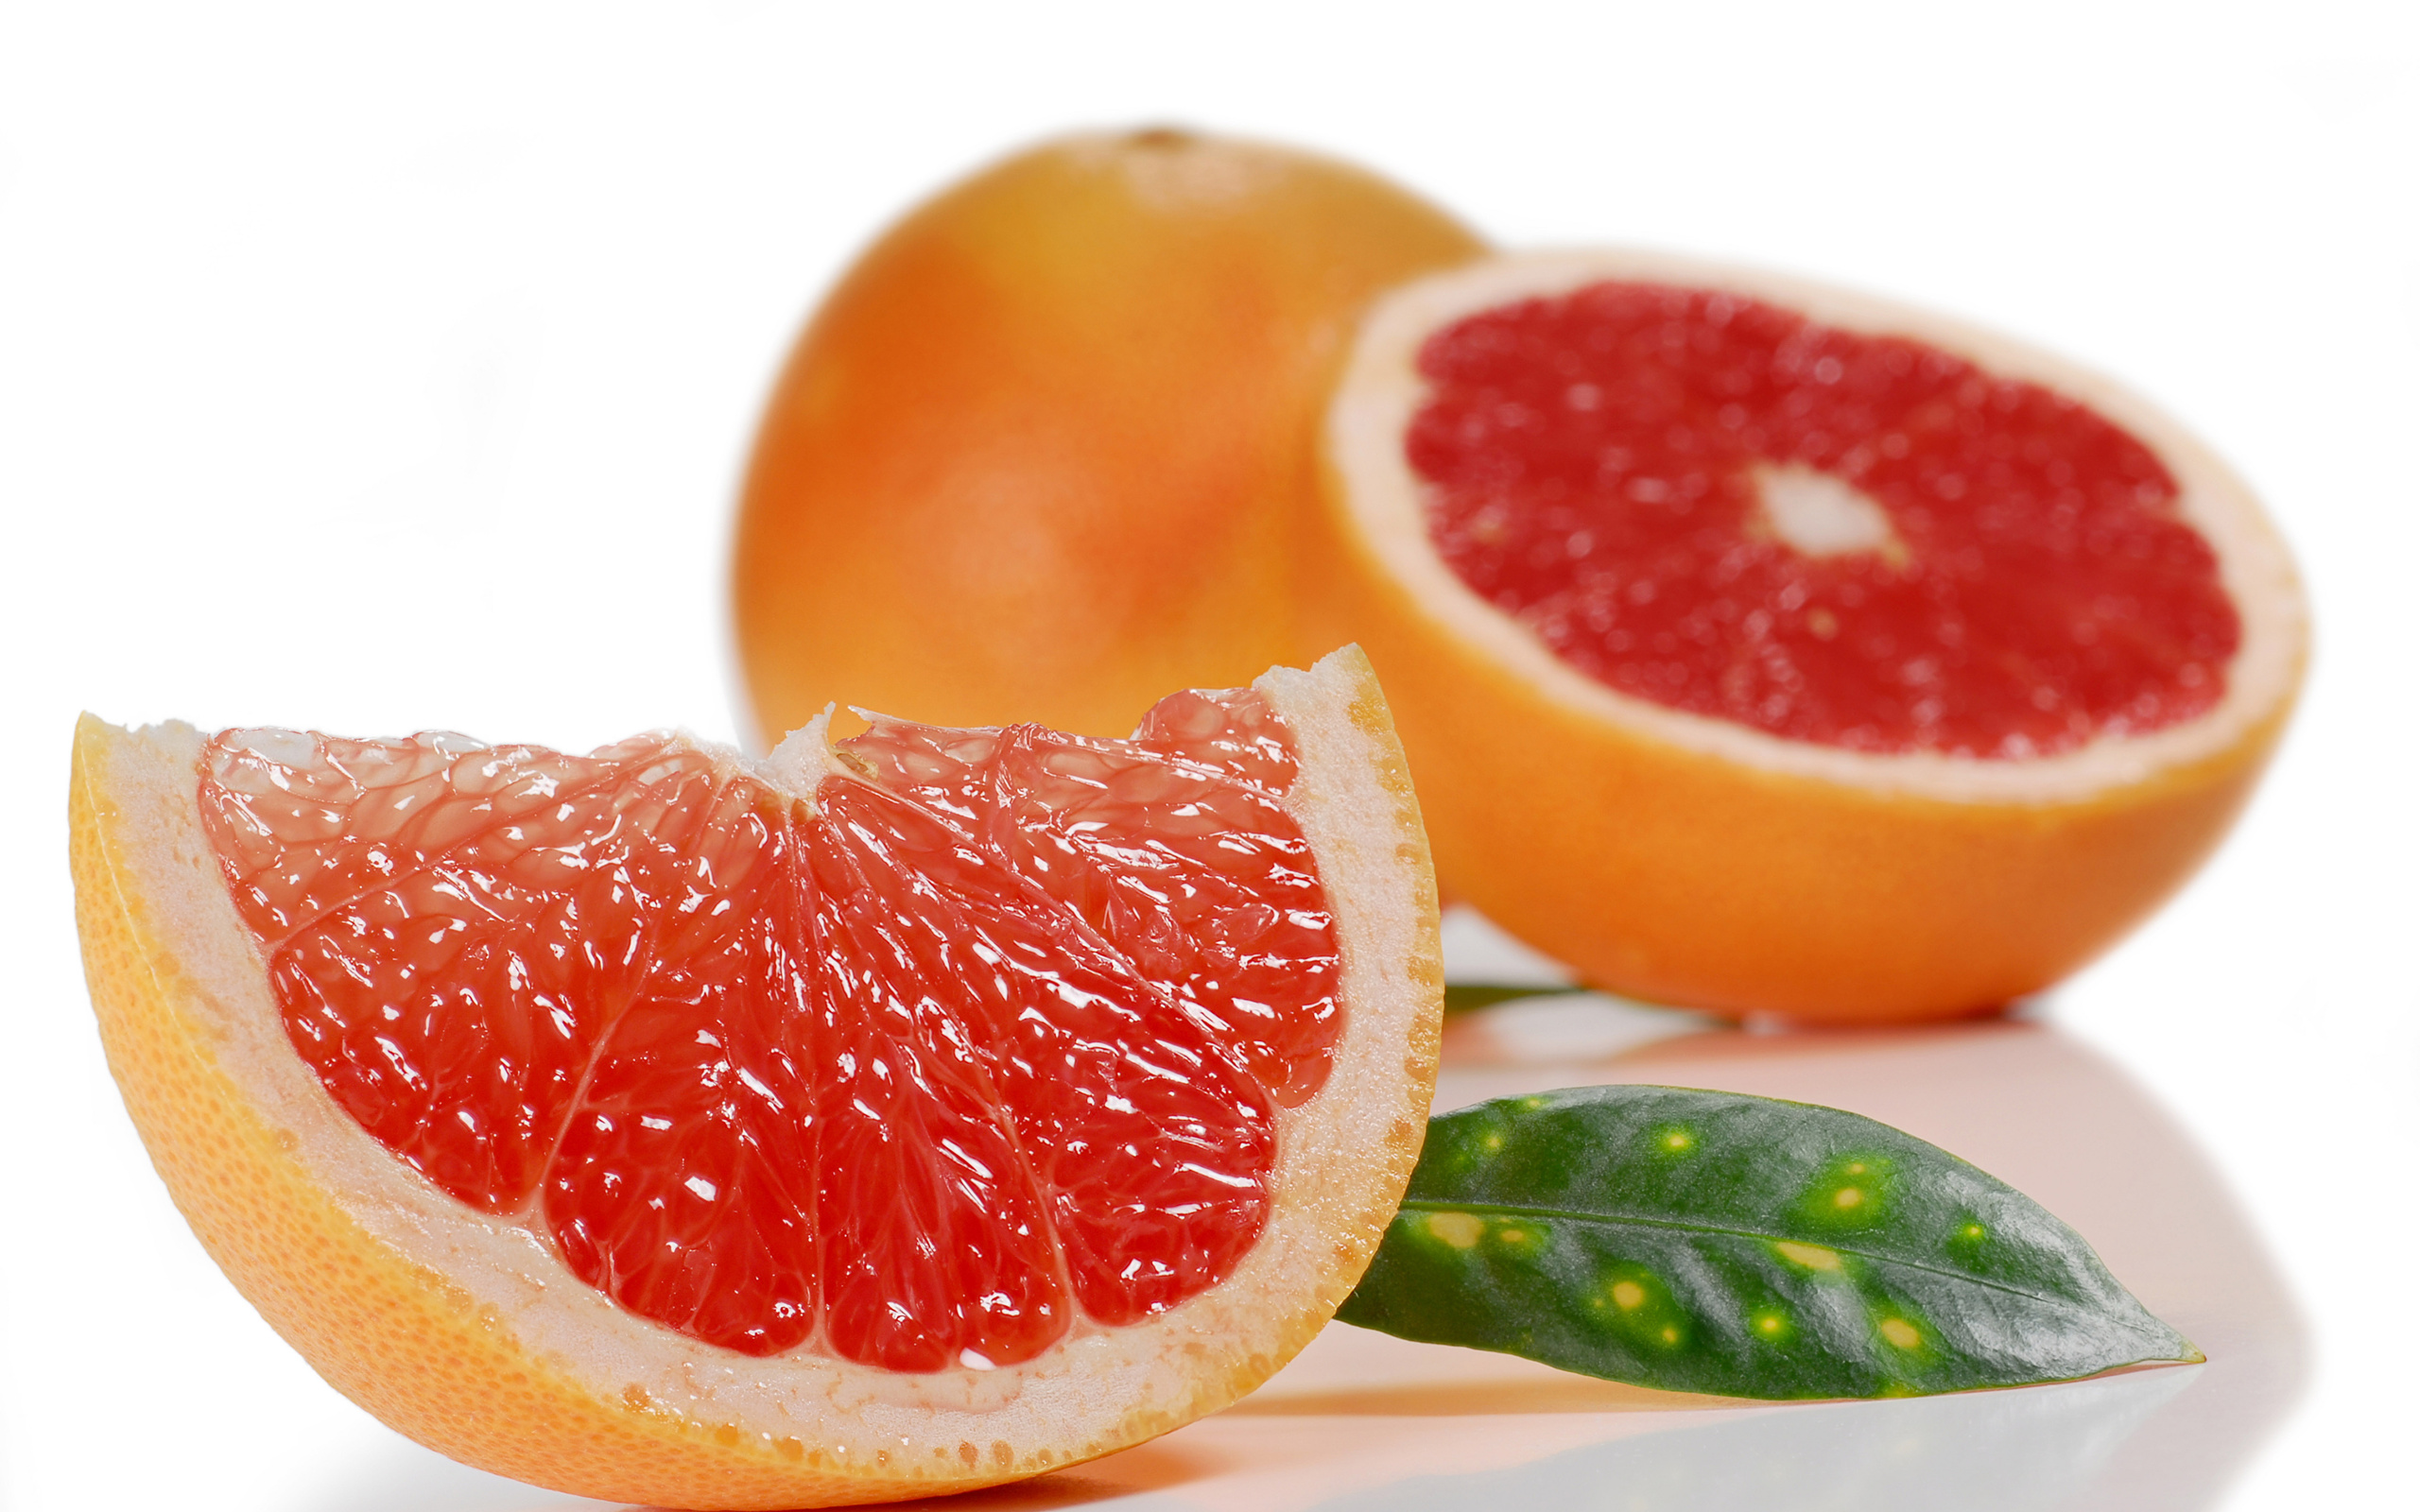 грейпфрут или апельсин